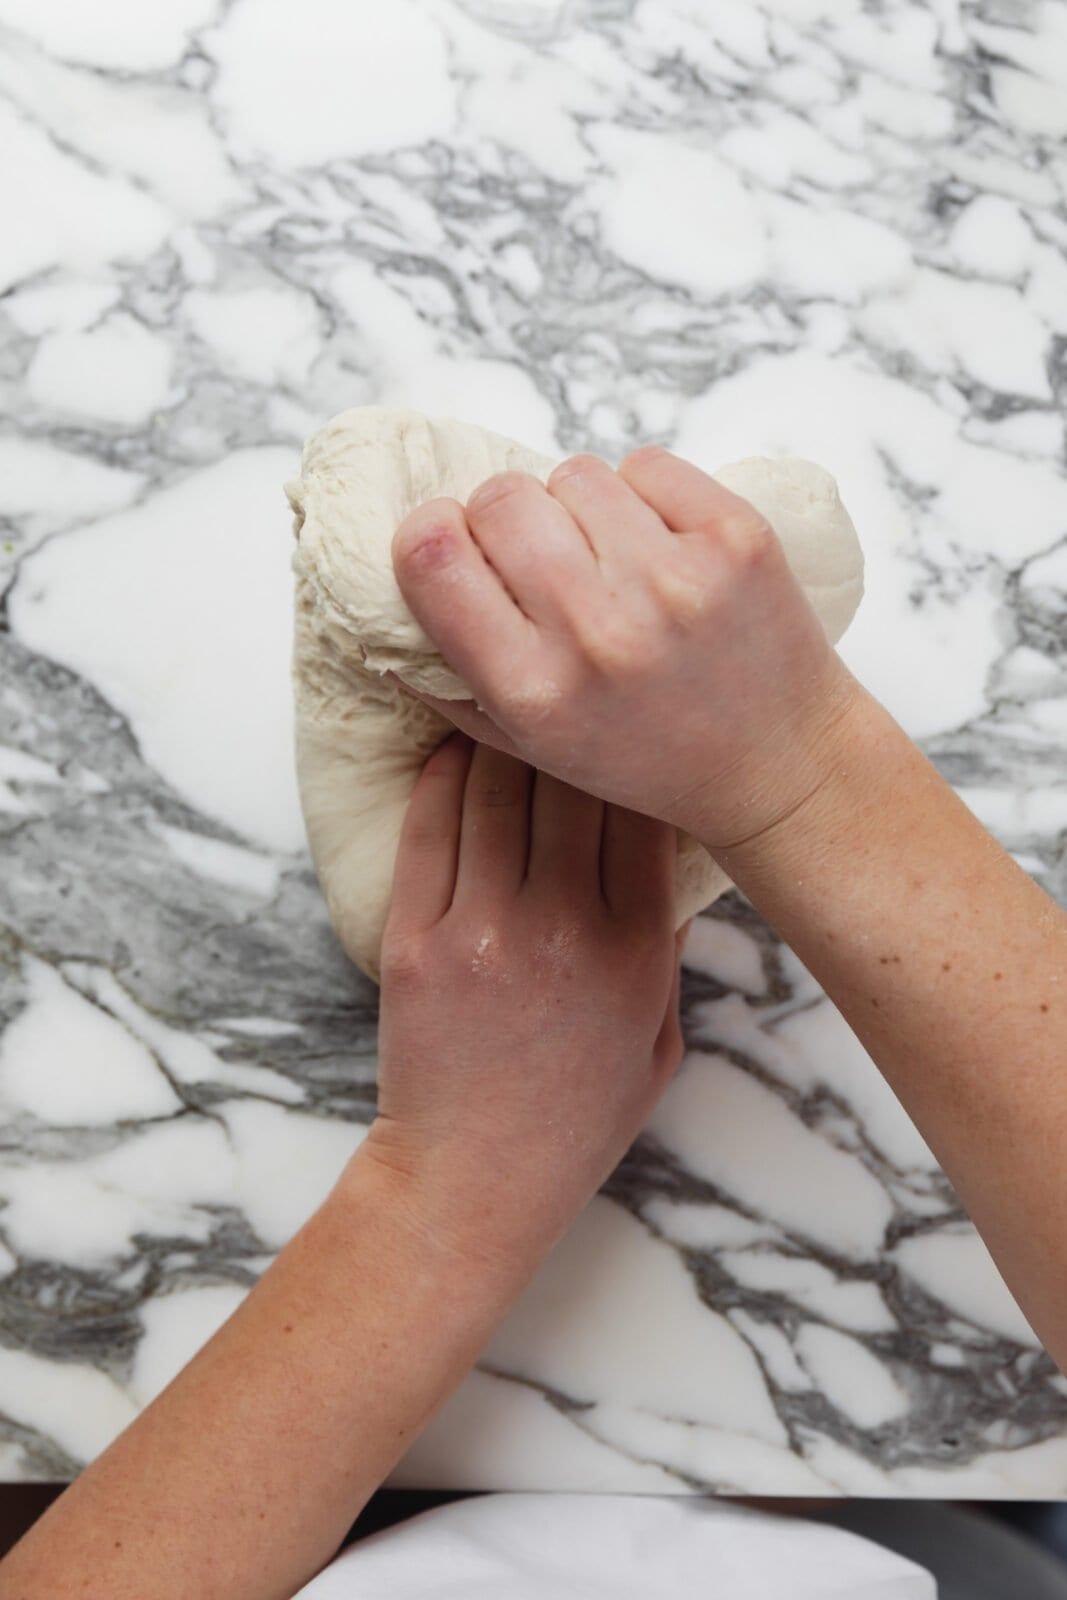 folding bagel dough over itself